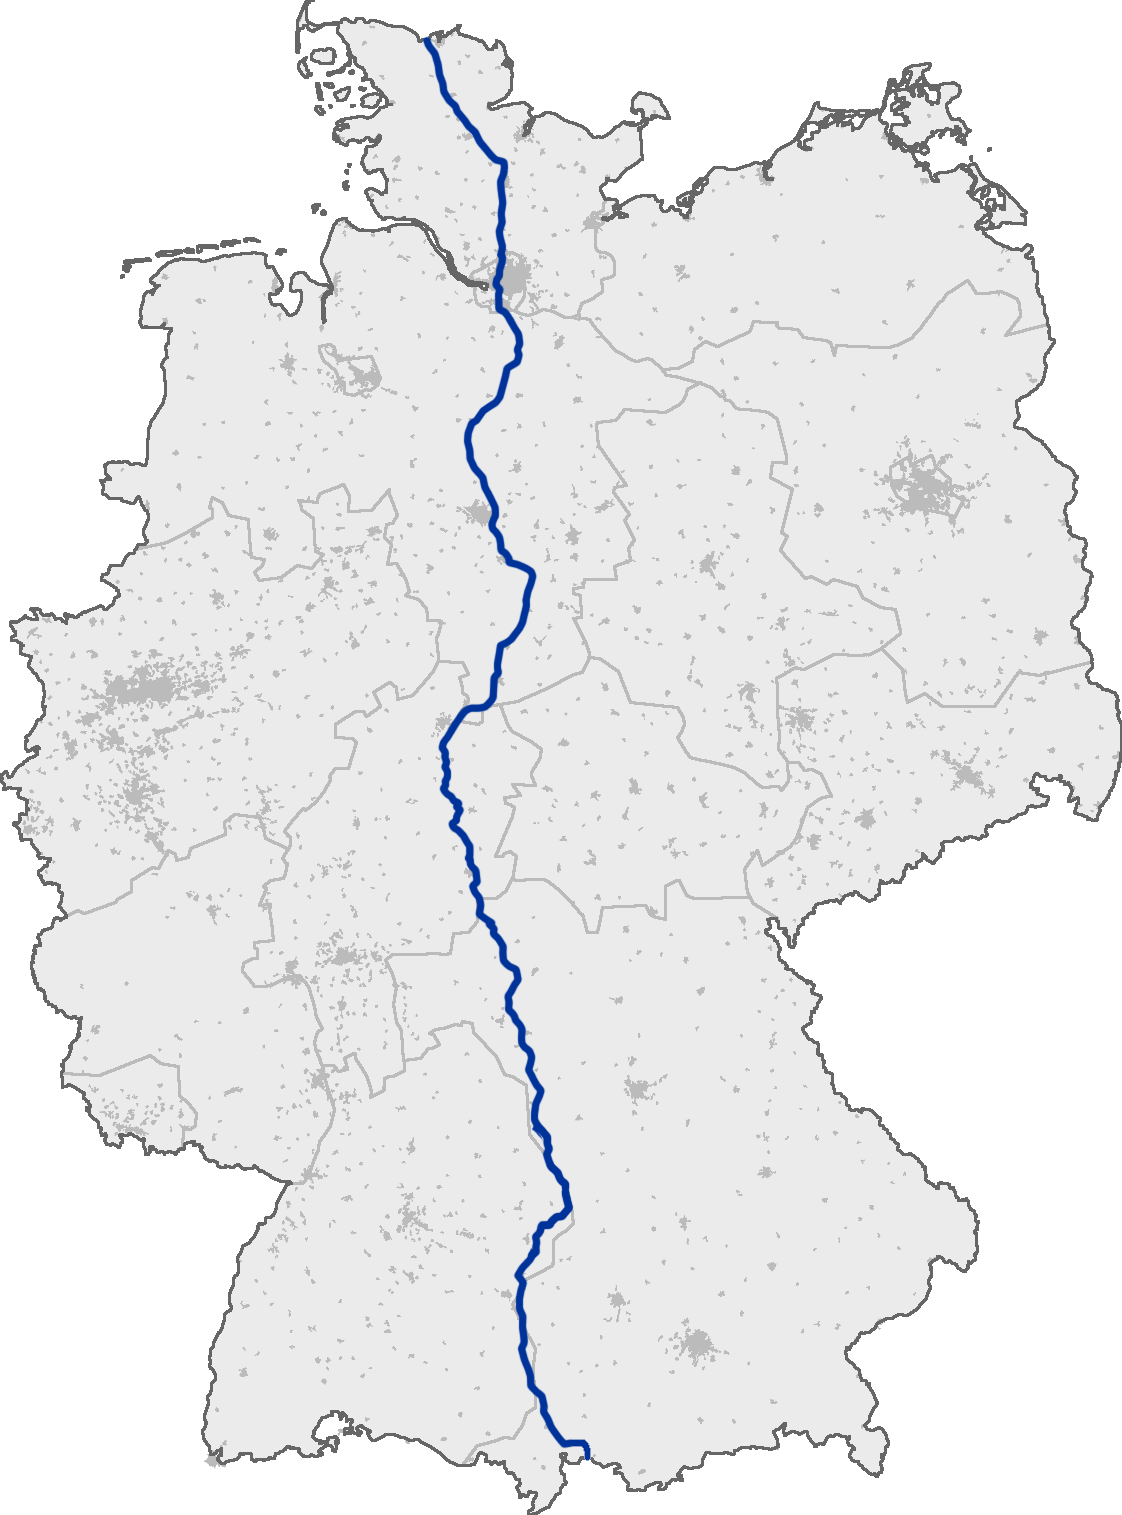 FileBundesautobahn Mappng Wikimedia Commons - Germany map autobahn